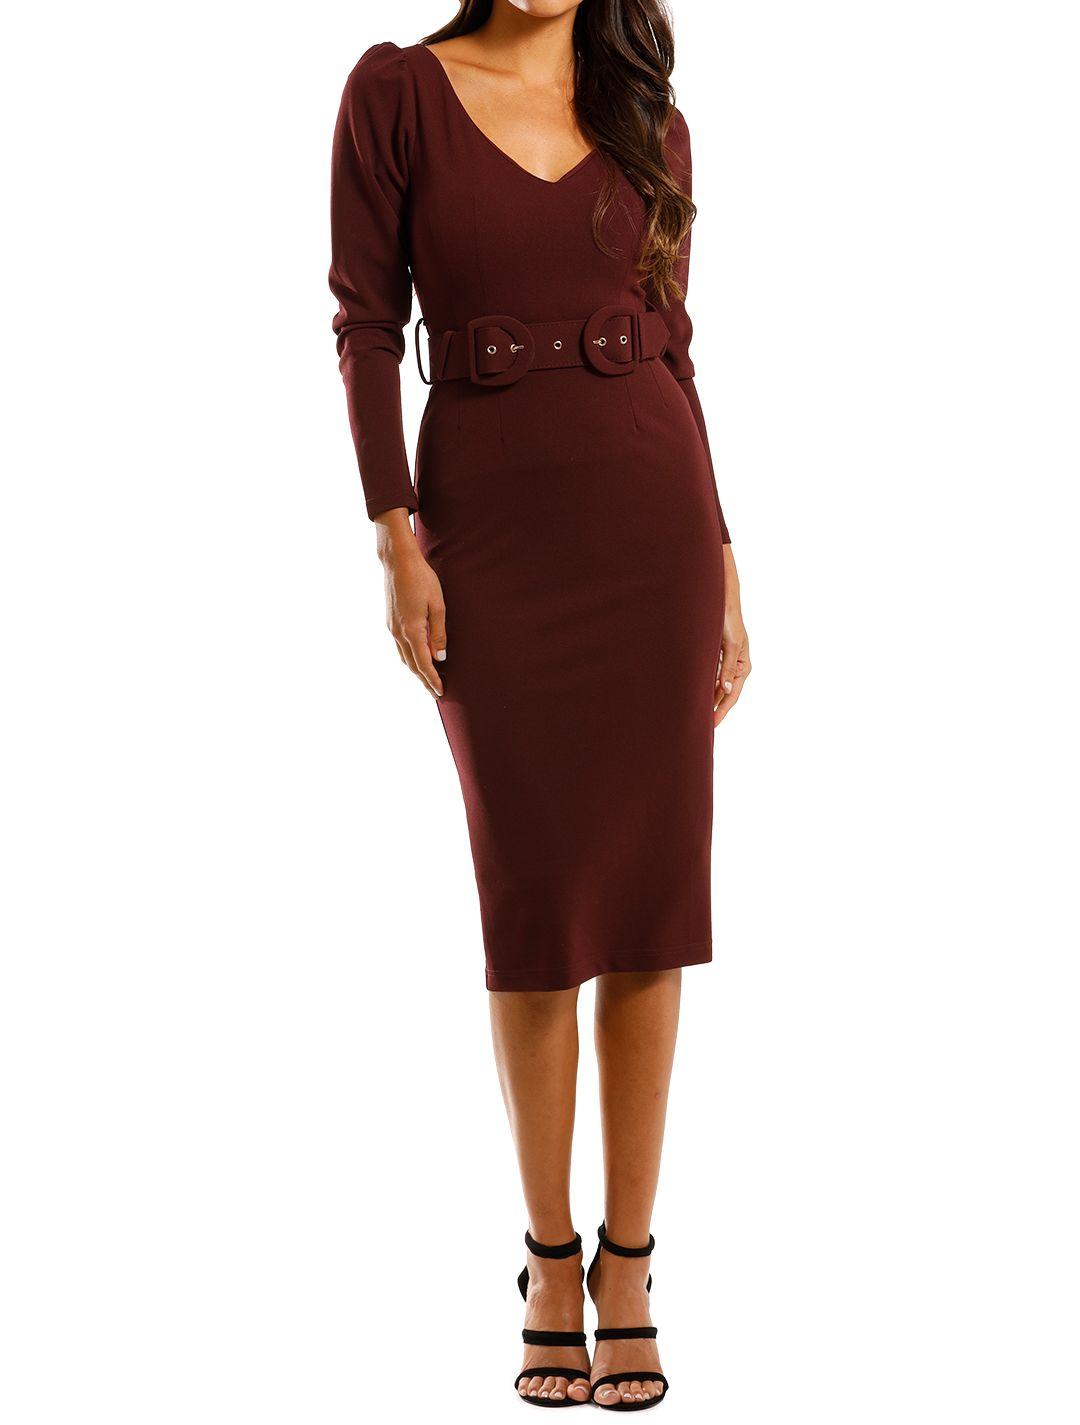 Pasduchas Cliché Midi Port Burgundy Dress Fitted Long Sleeves